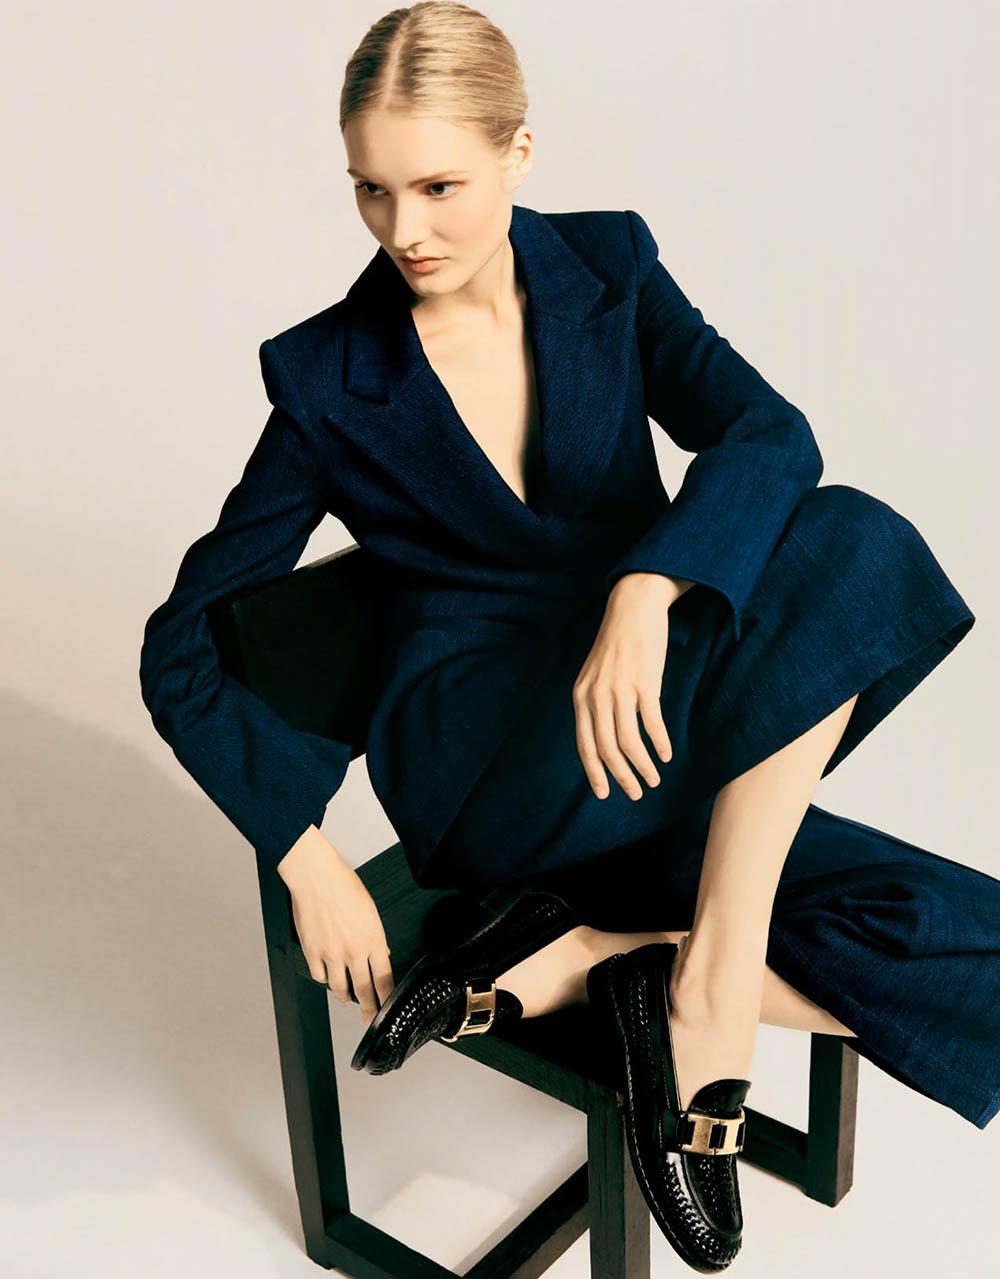 Nana Skovgaard by Levon Baird for Harper's Bazaar Australia June July 2020